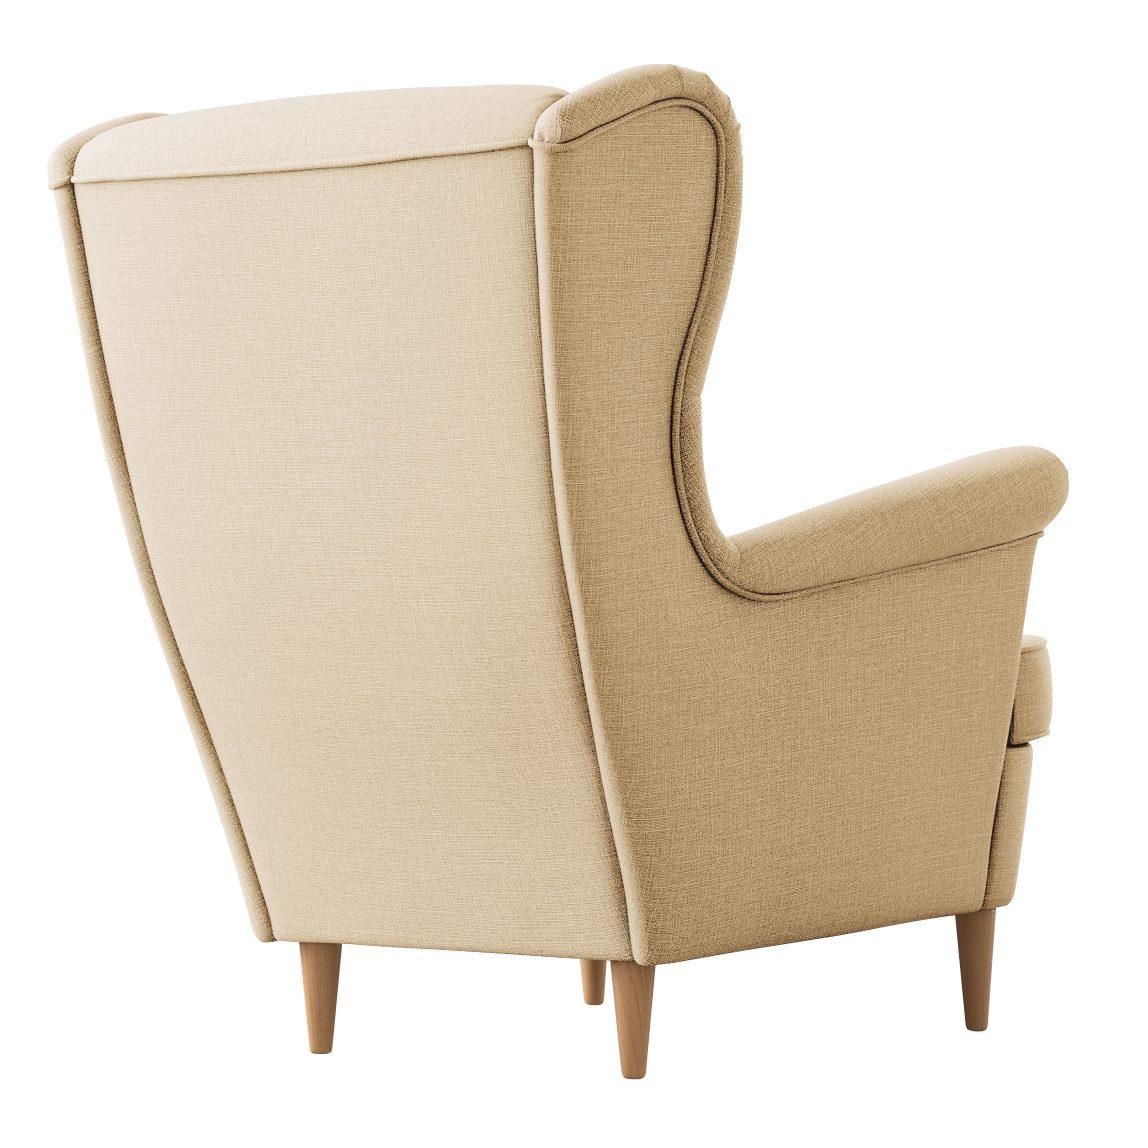 Бежевое кресло Страндмон ikea икея на ножках